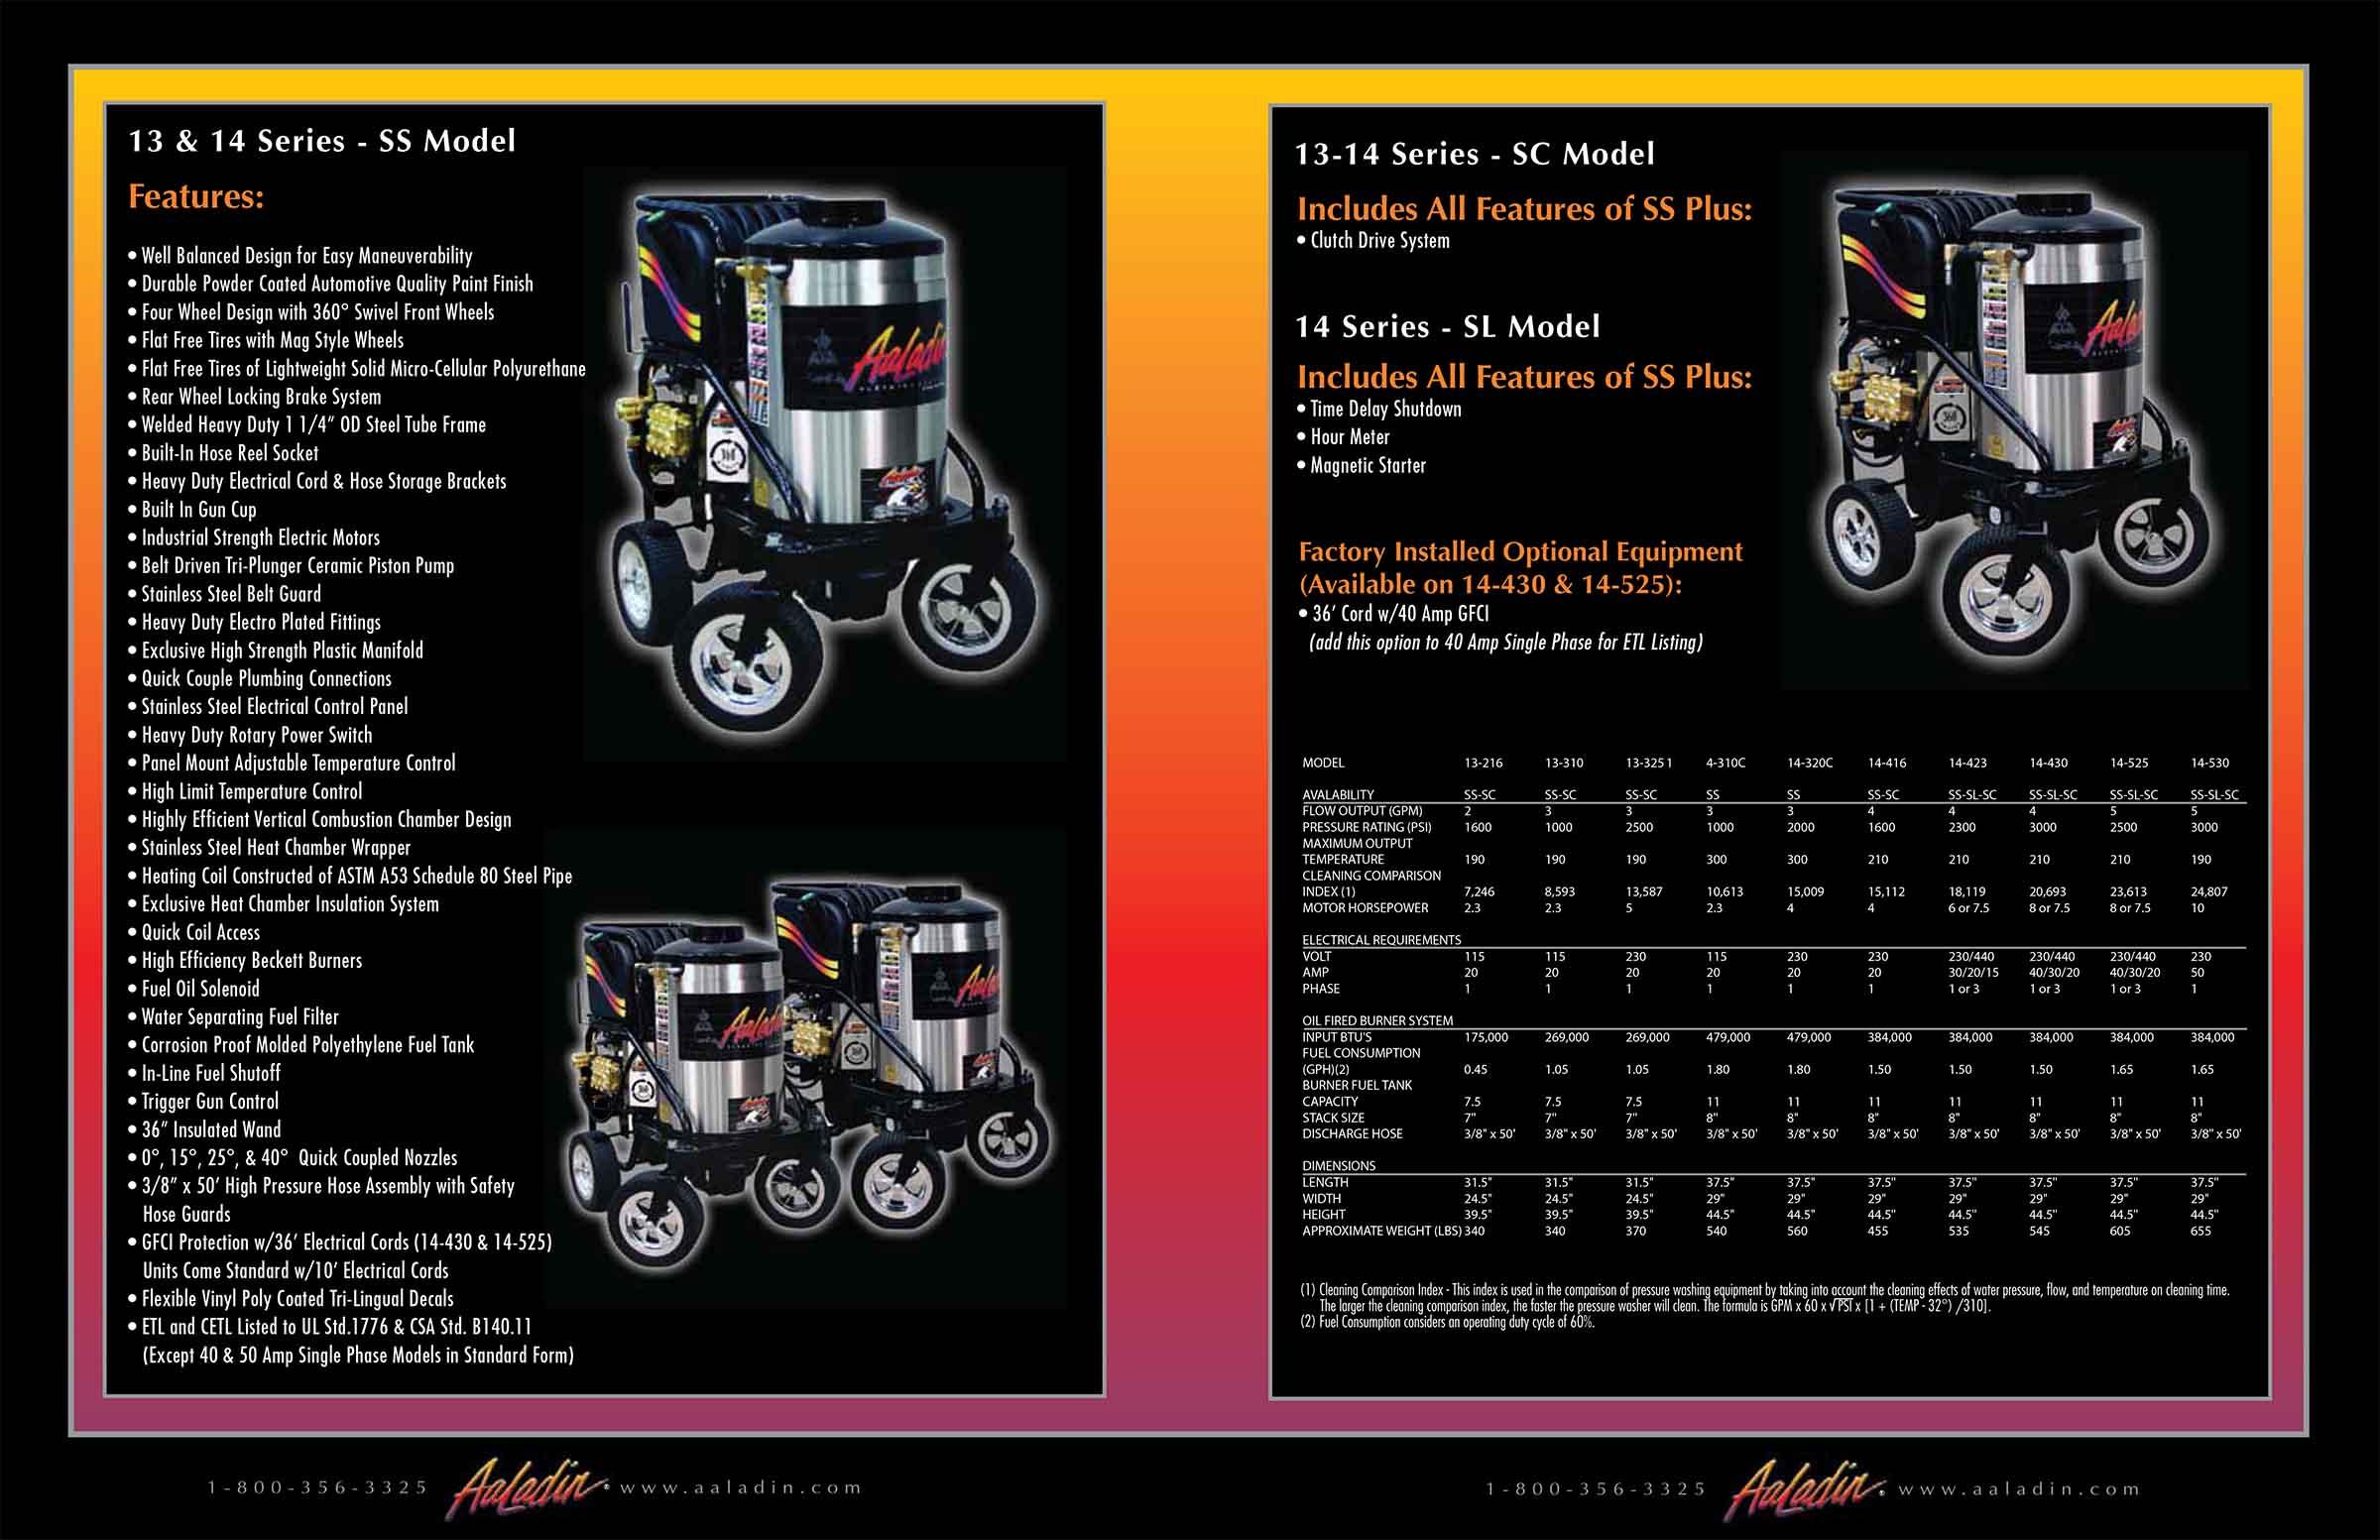 Aaladin 13-14 Series SS & SC Model equipment pamphlet